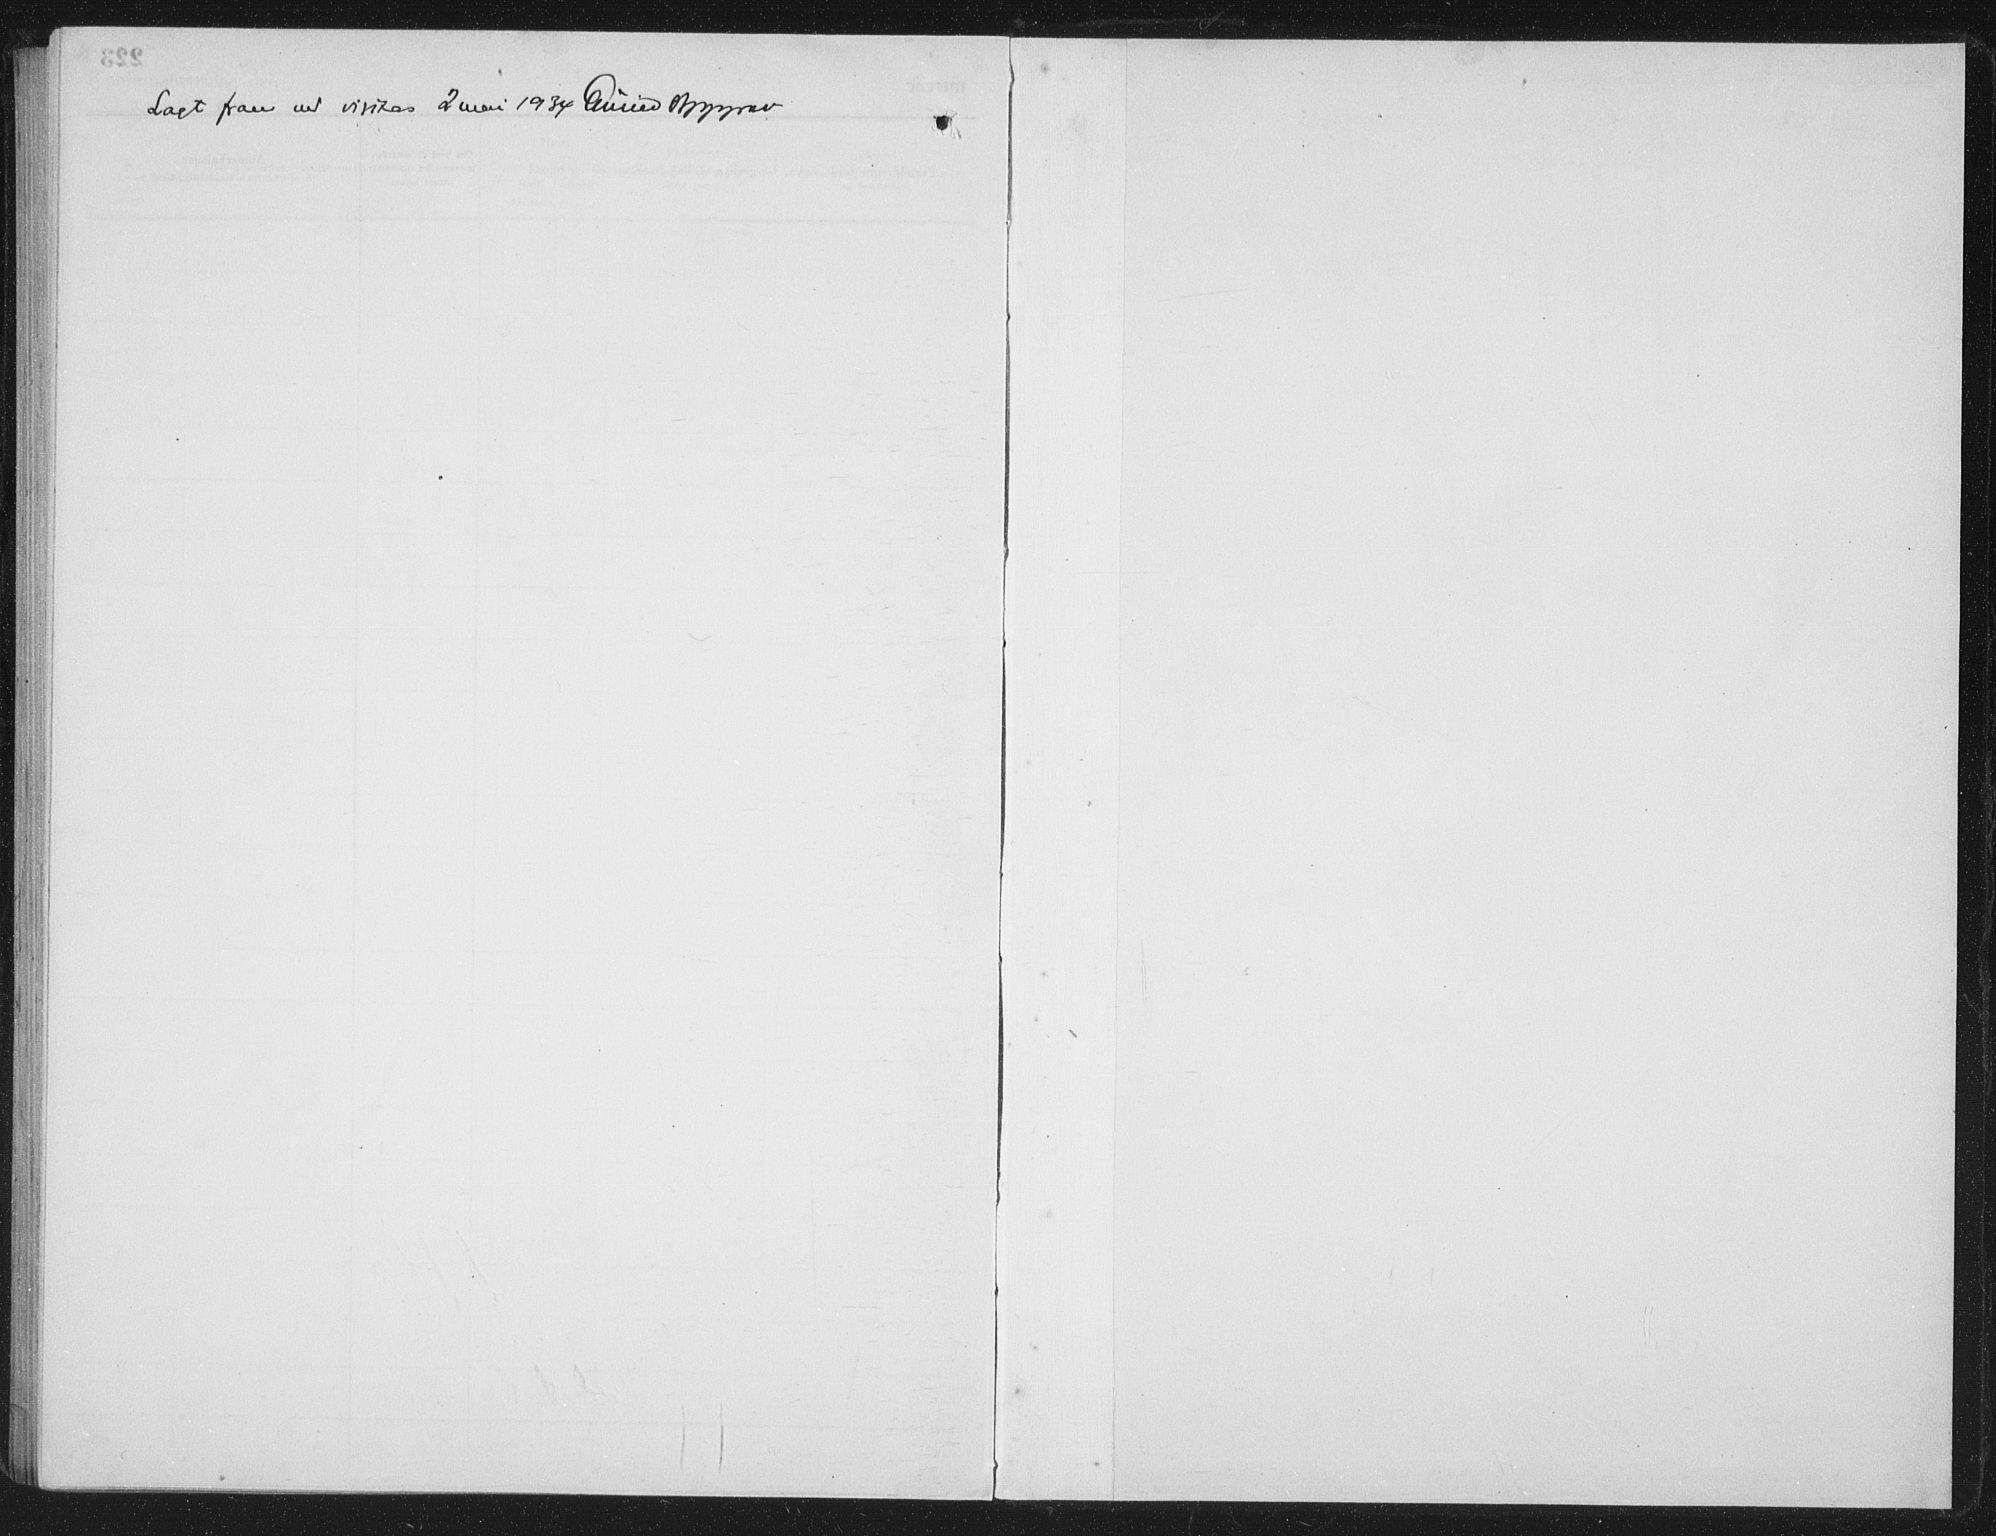 SAT, Ministerialprotokoller, klokkerbøker og fødselsregistre - Nordland, 801/L0037: Klokkerbok nr. 801C12, 1921-1937